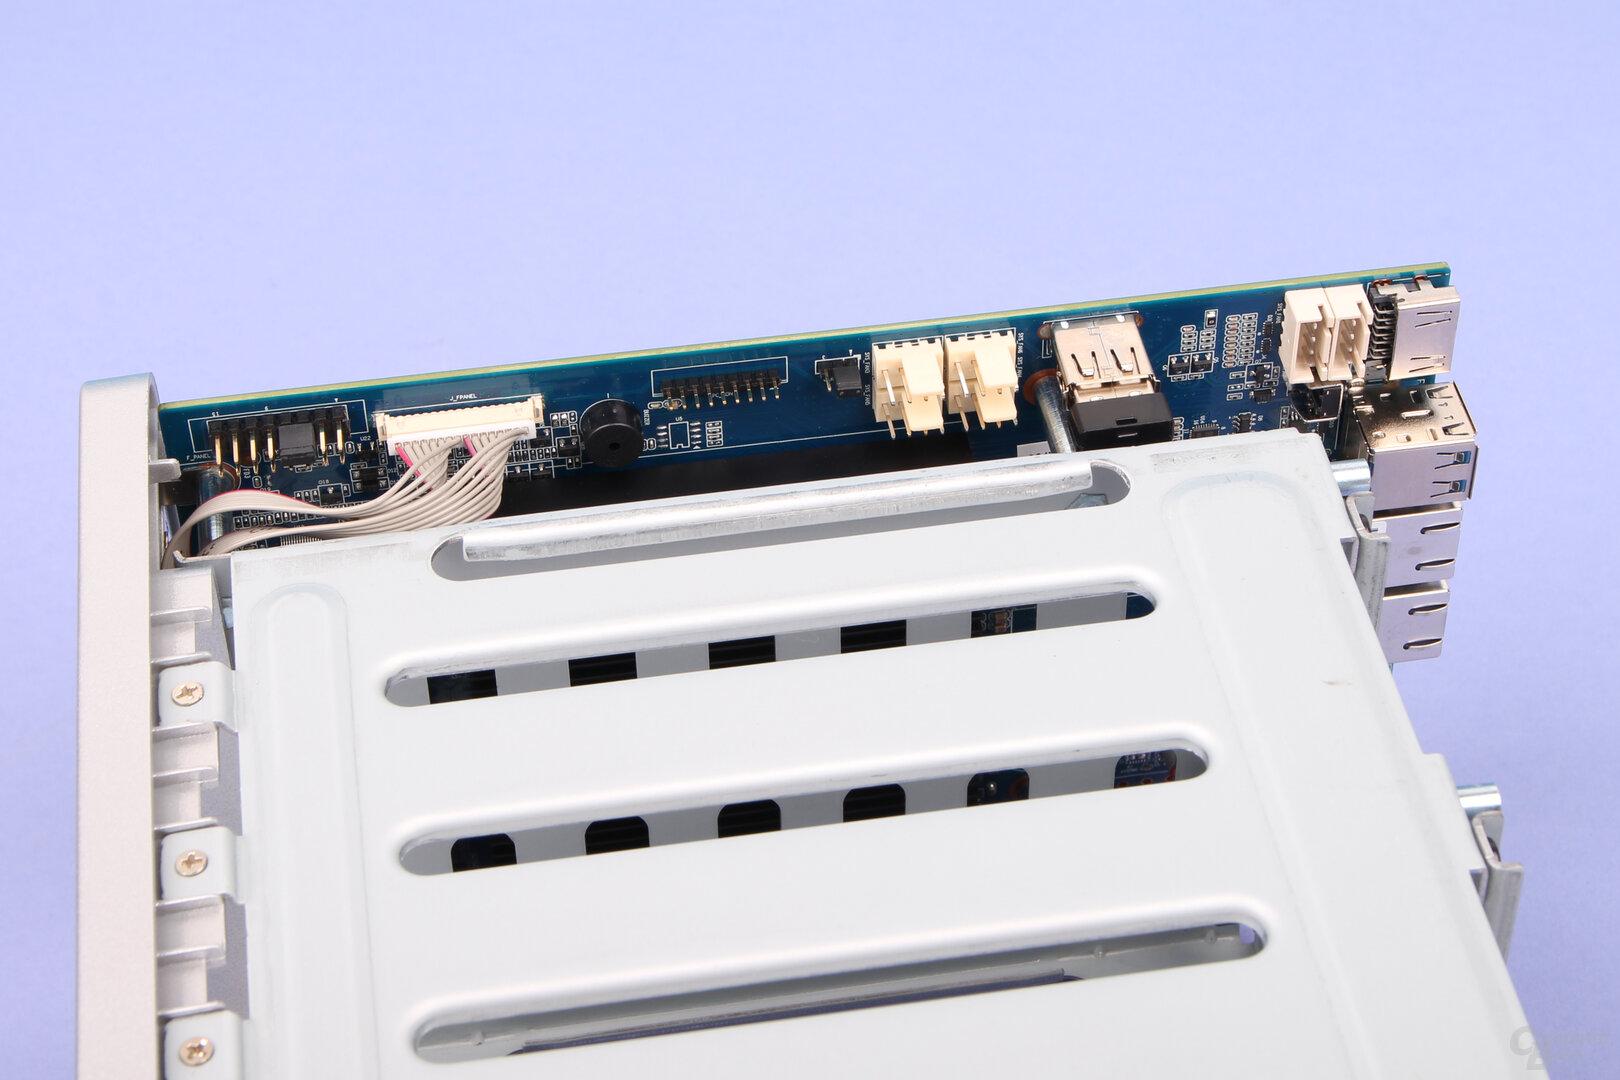 TerraMaster F5-221: Lüfter-Anschlüsse und USB-Port